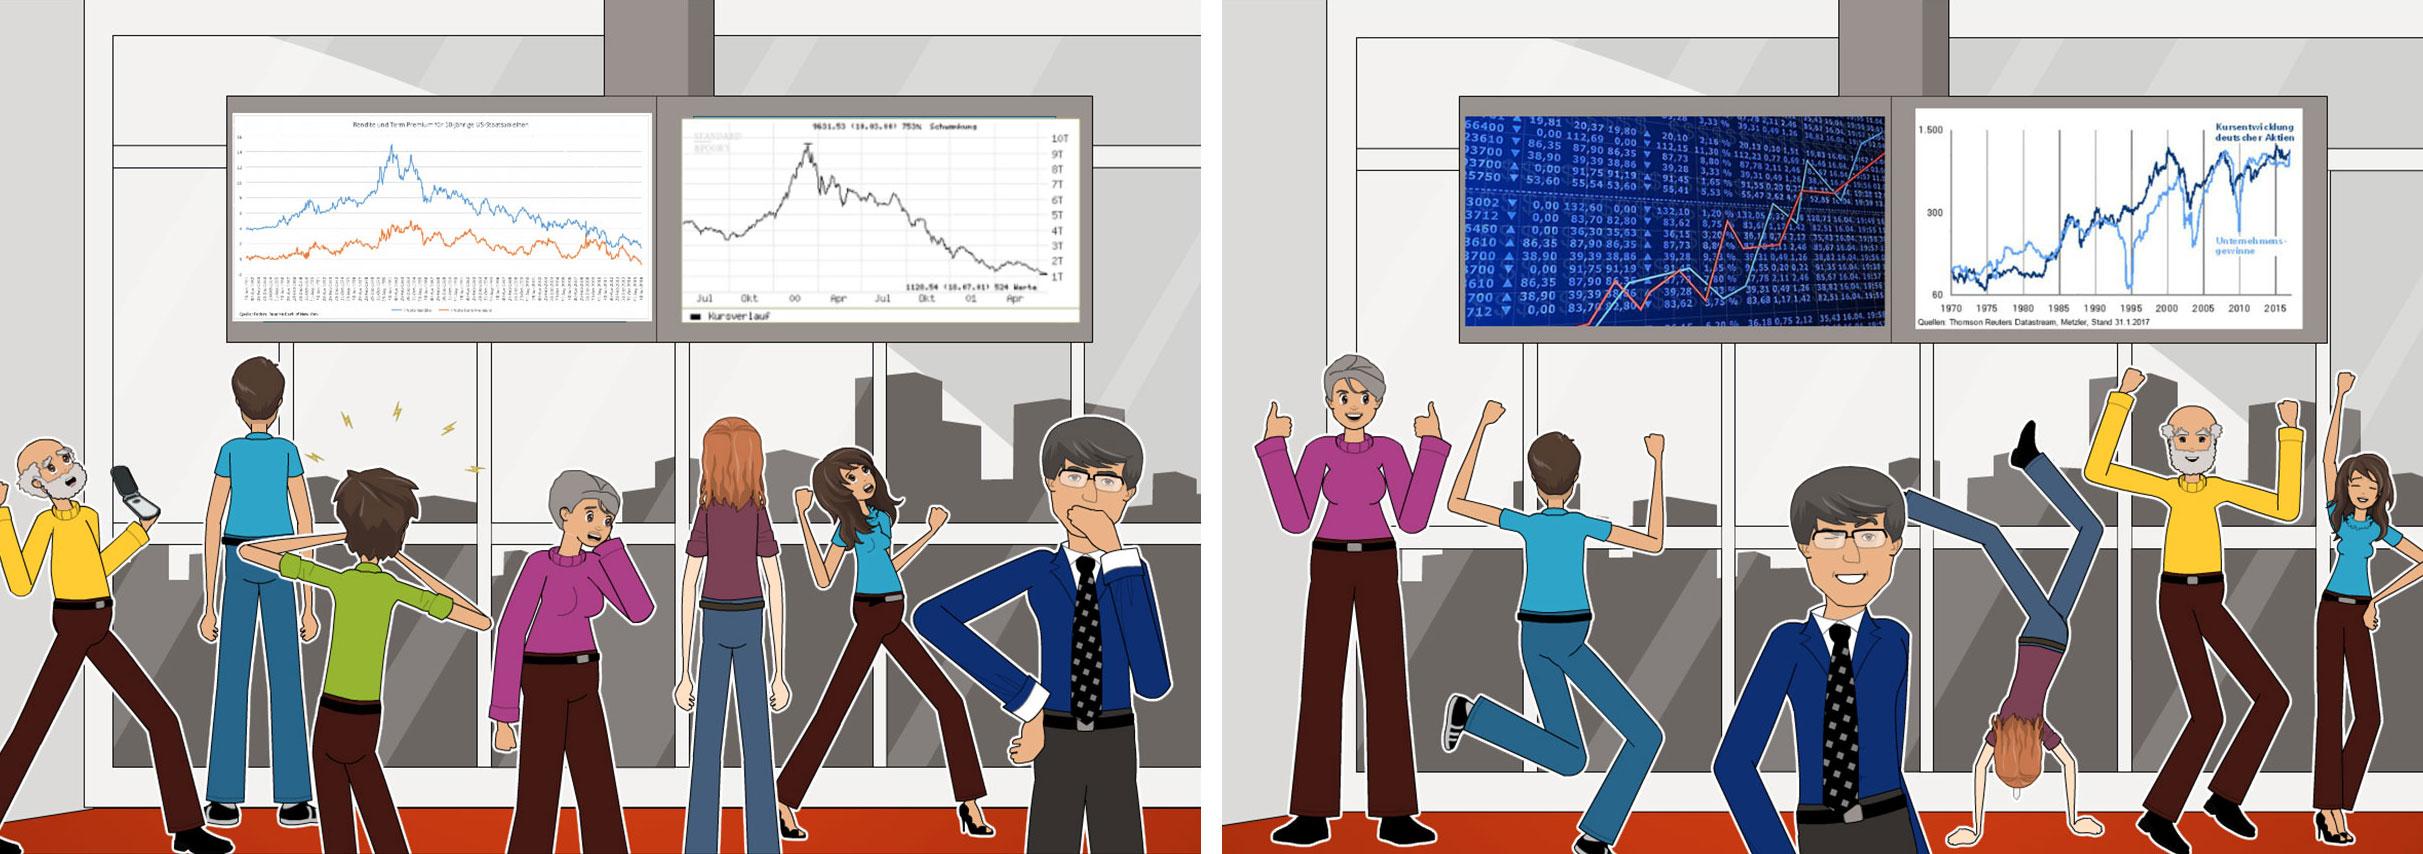 Investition-Modell-Pramhas